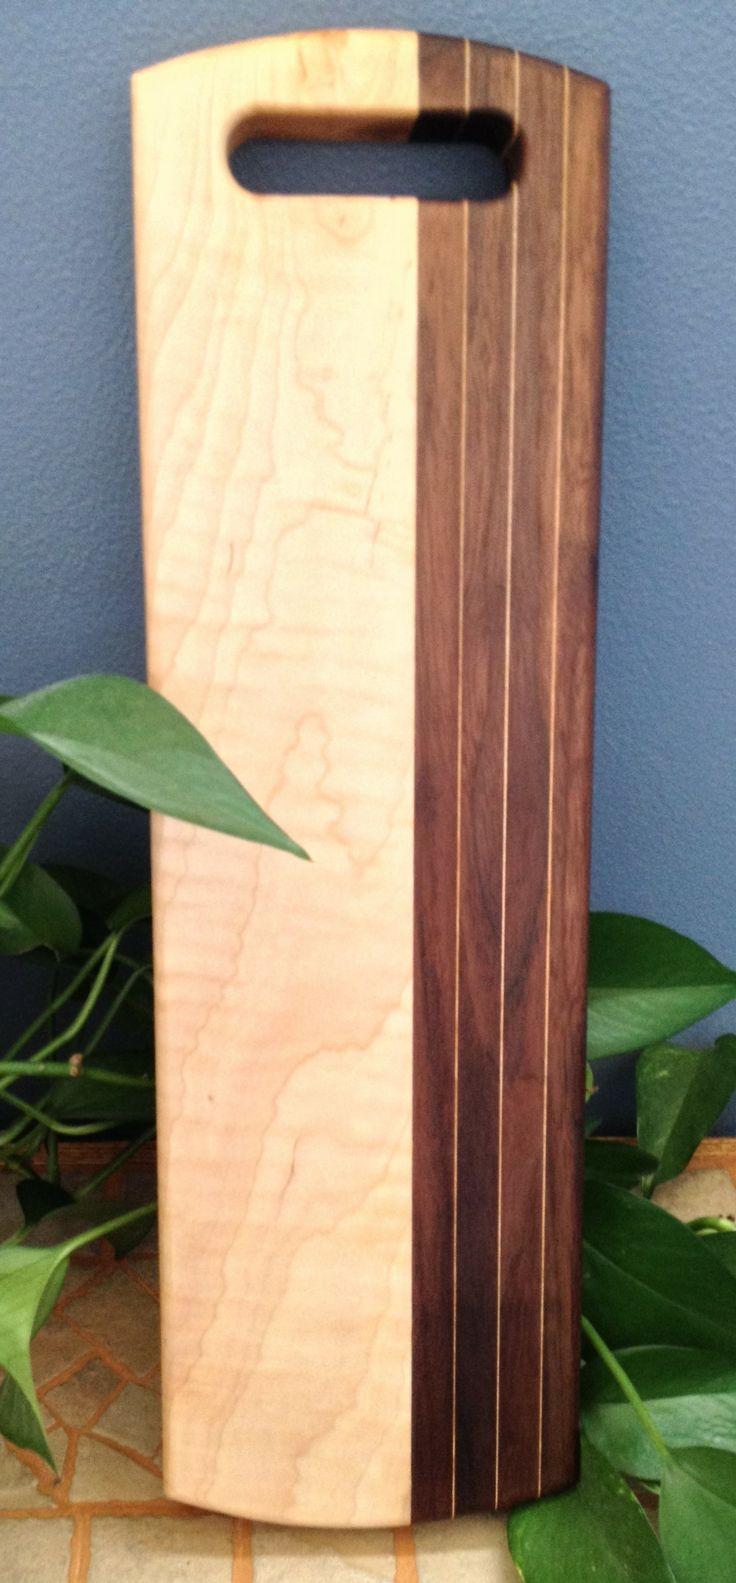 Wood Species: Curly Maple, Walnut